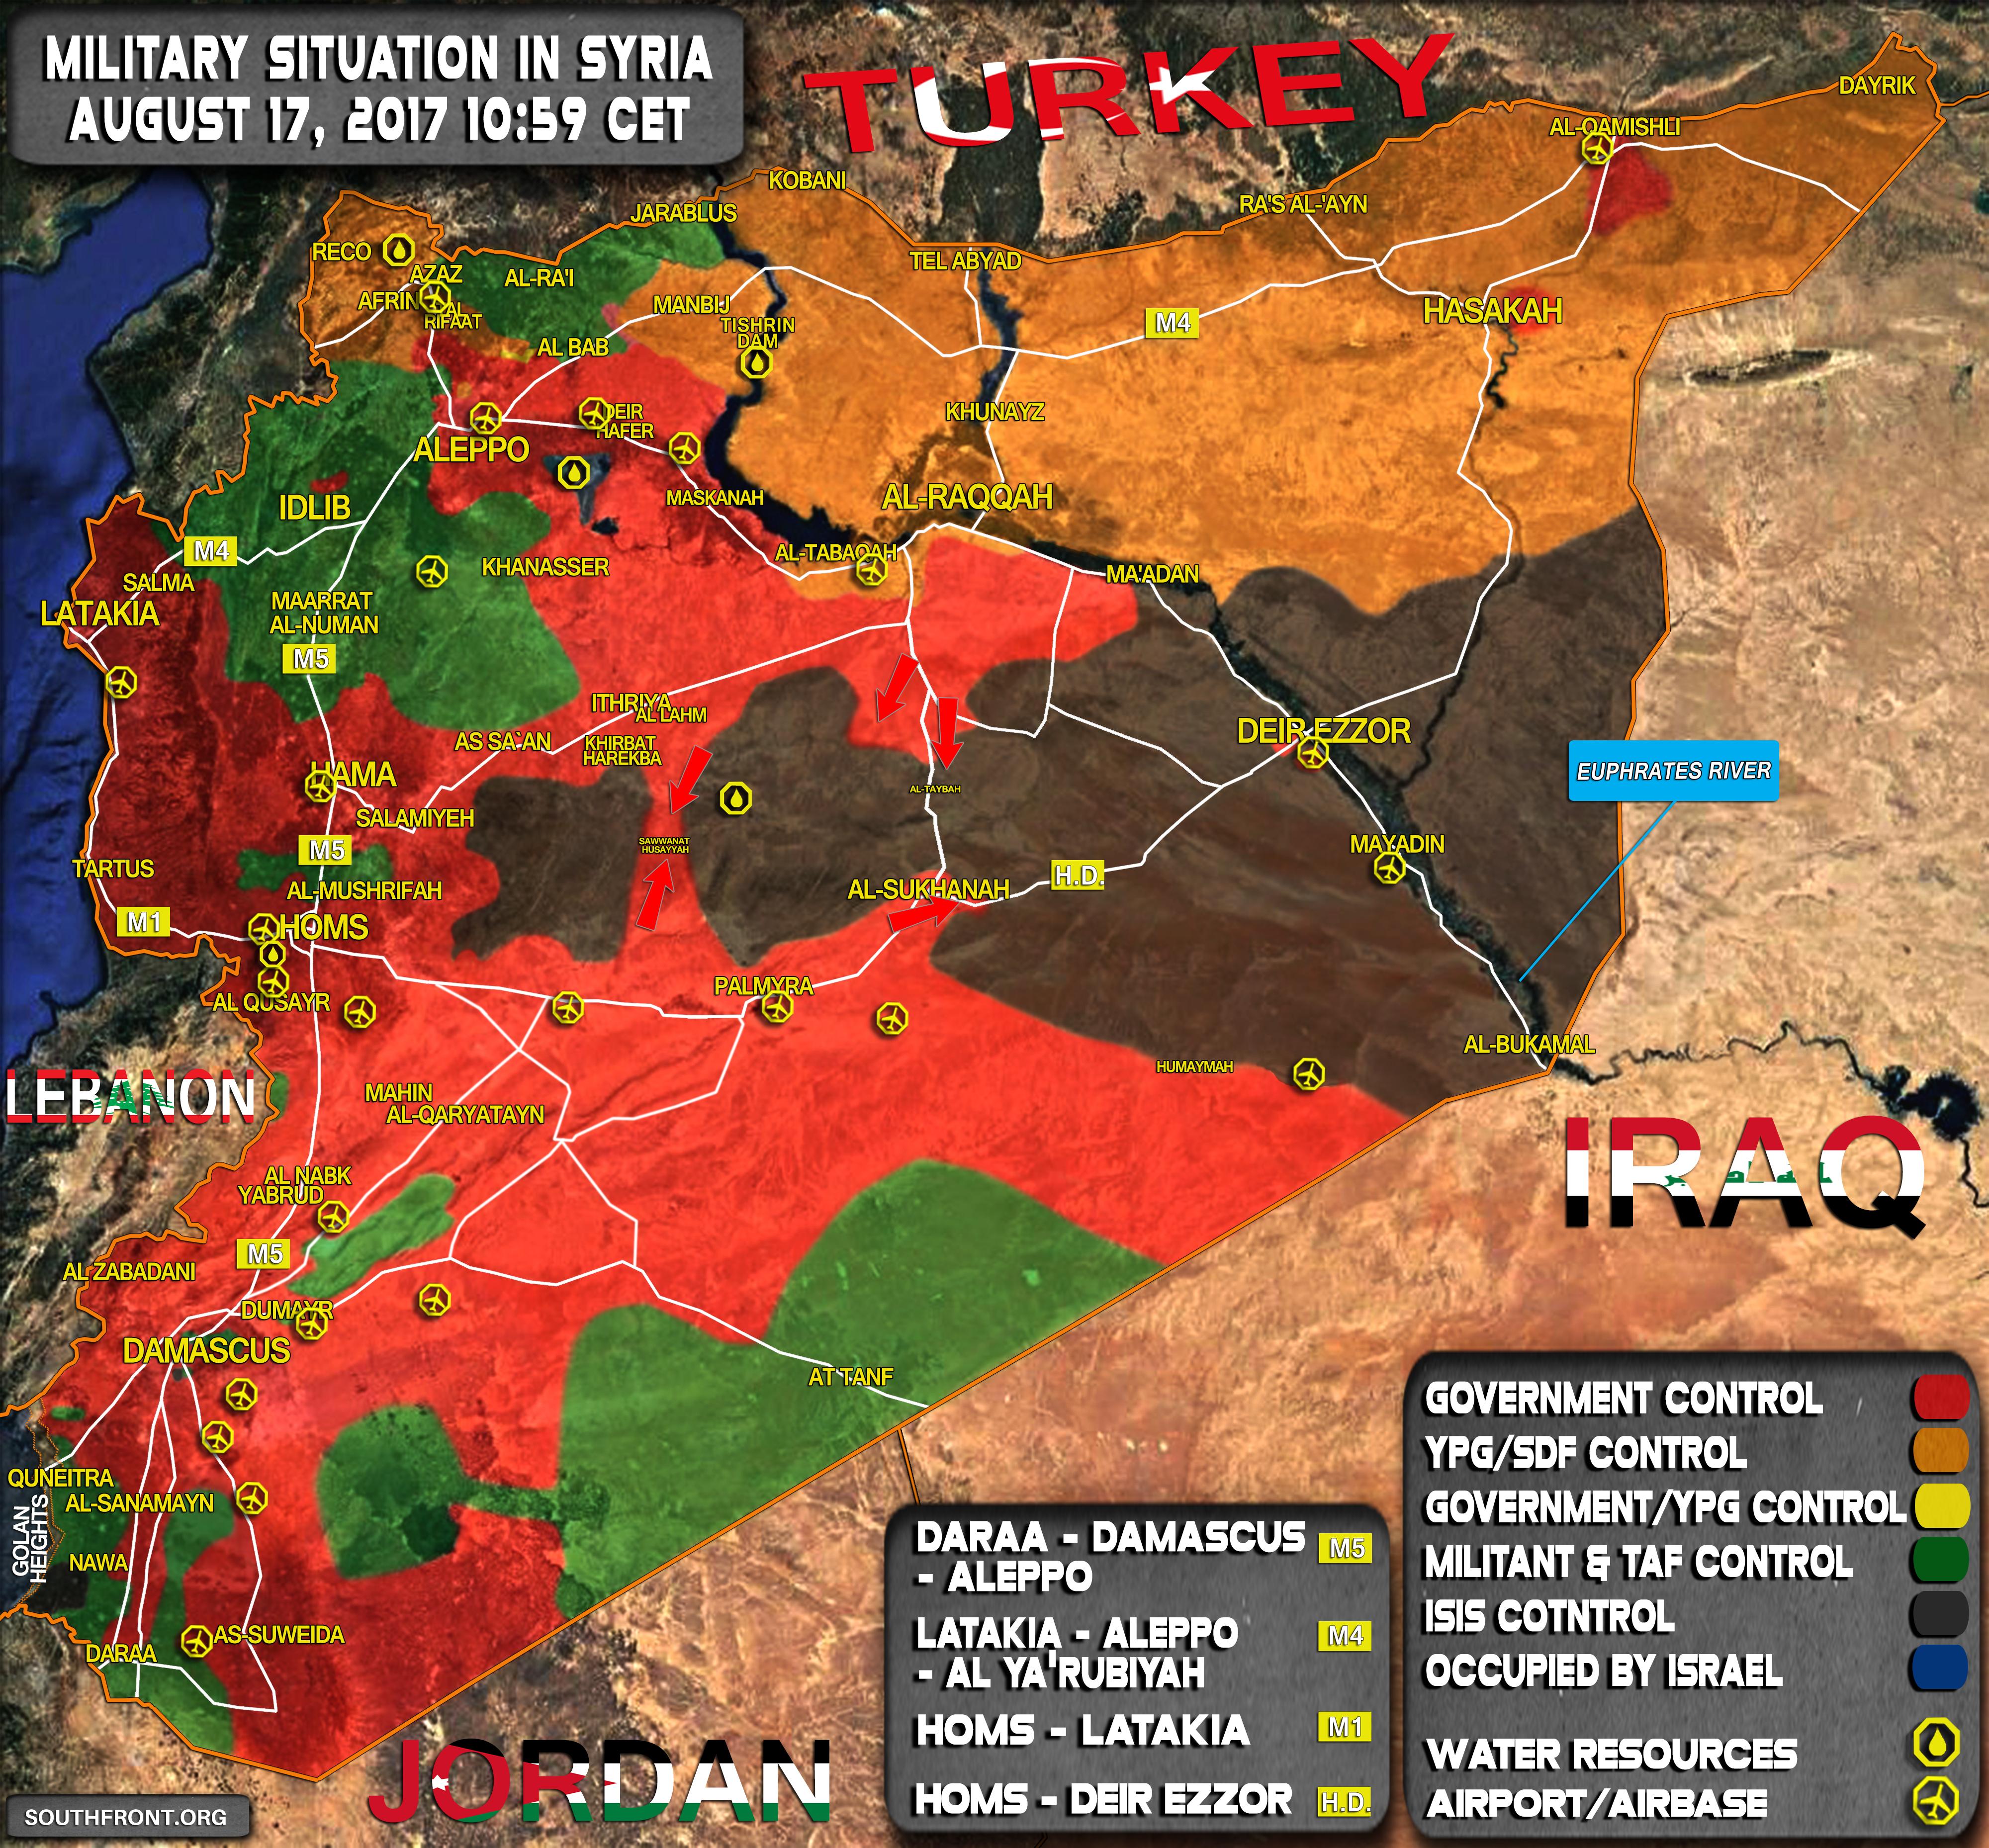 17aug_syria_war_map.jpg?x42033